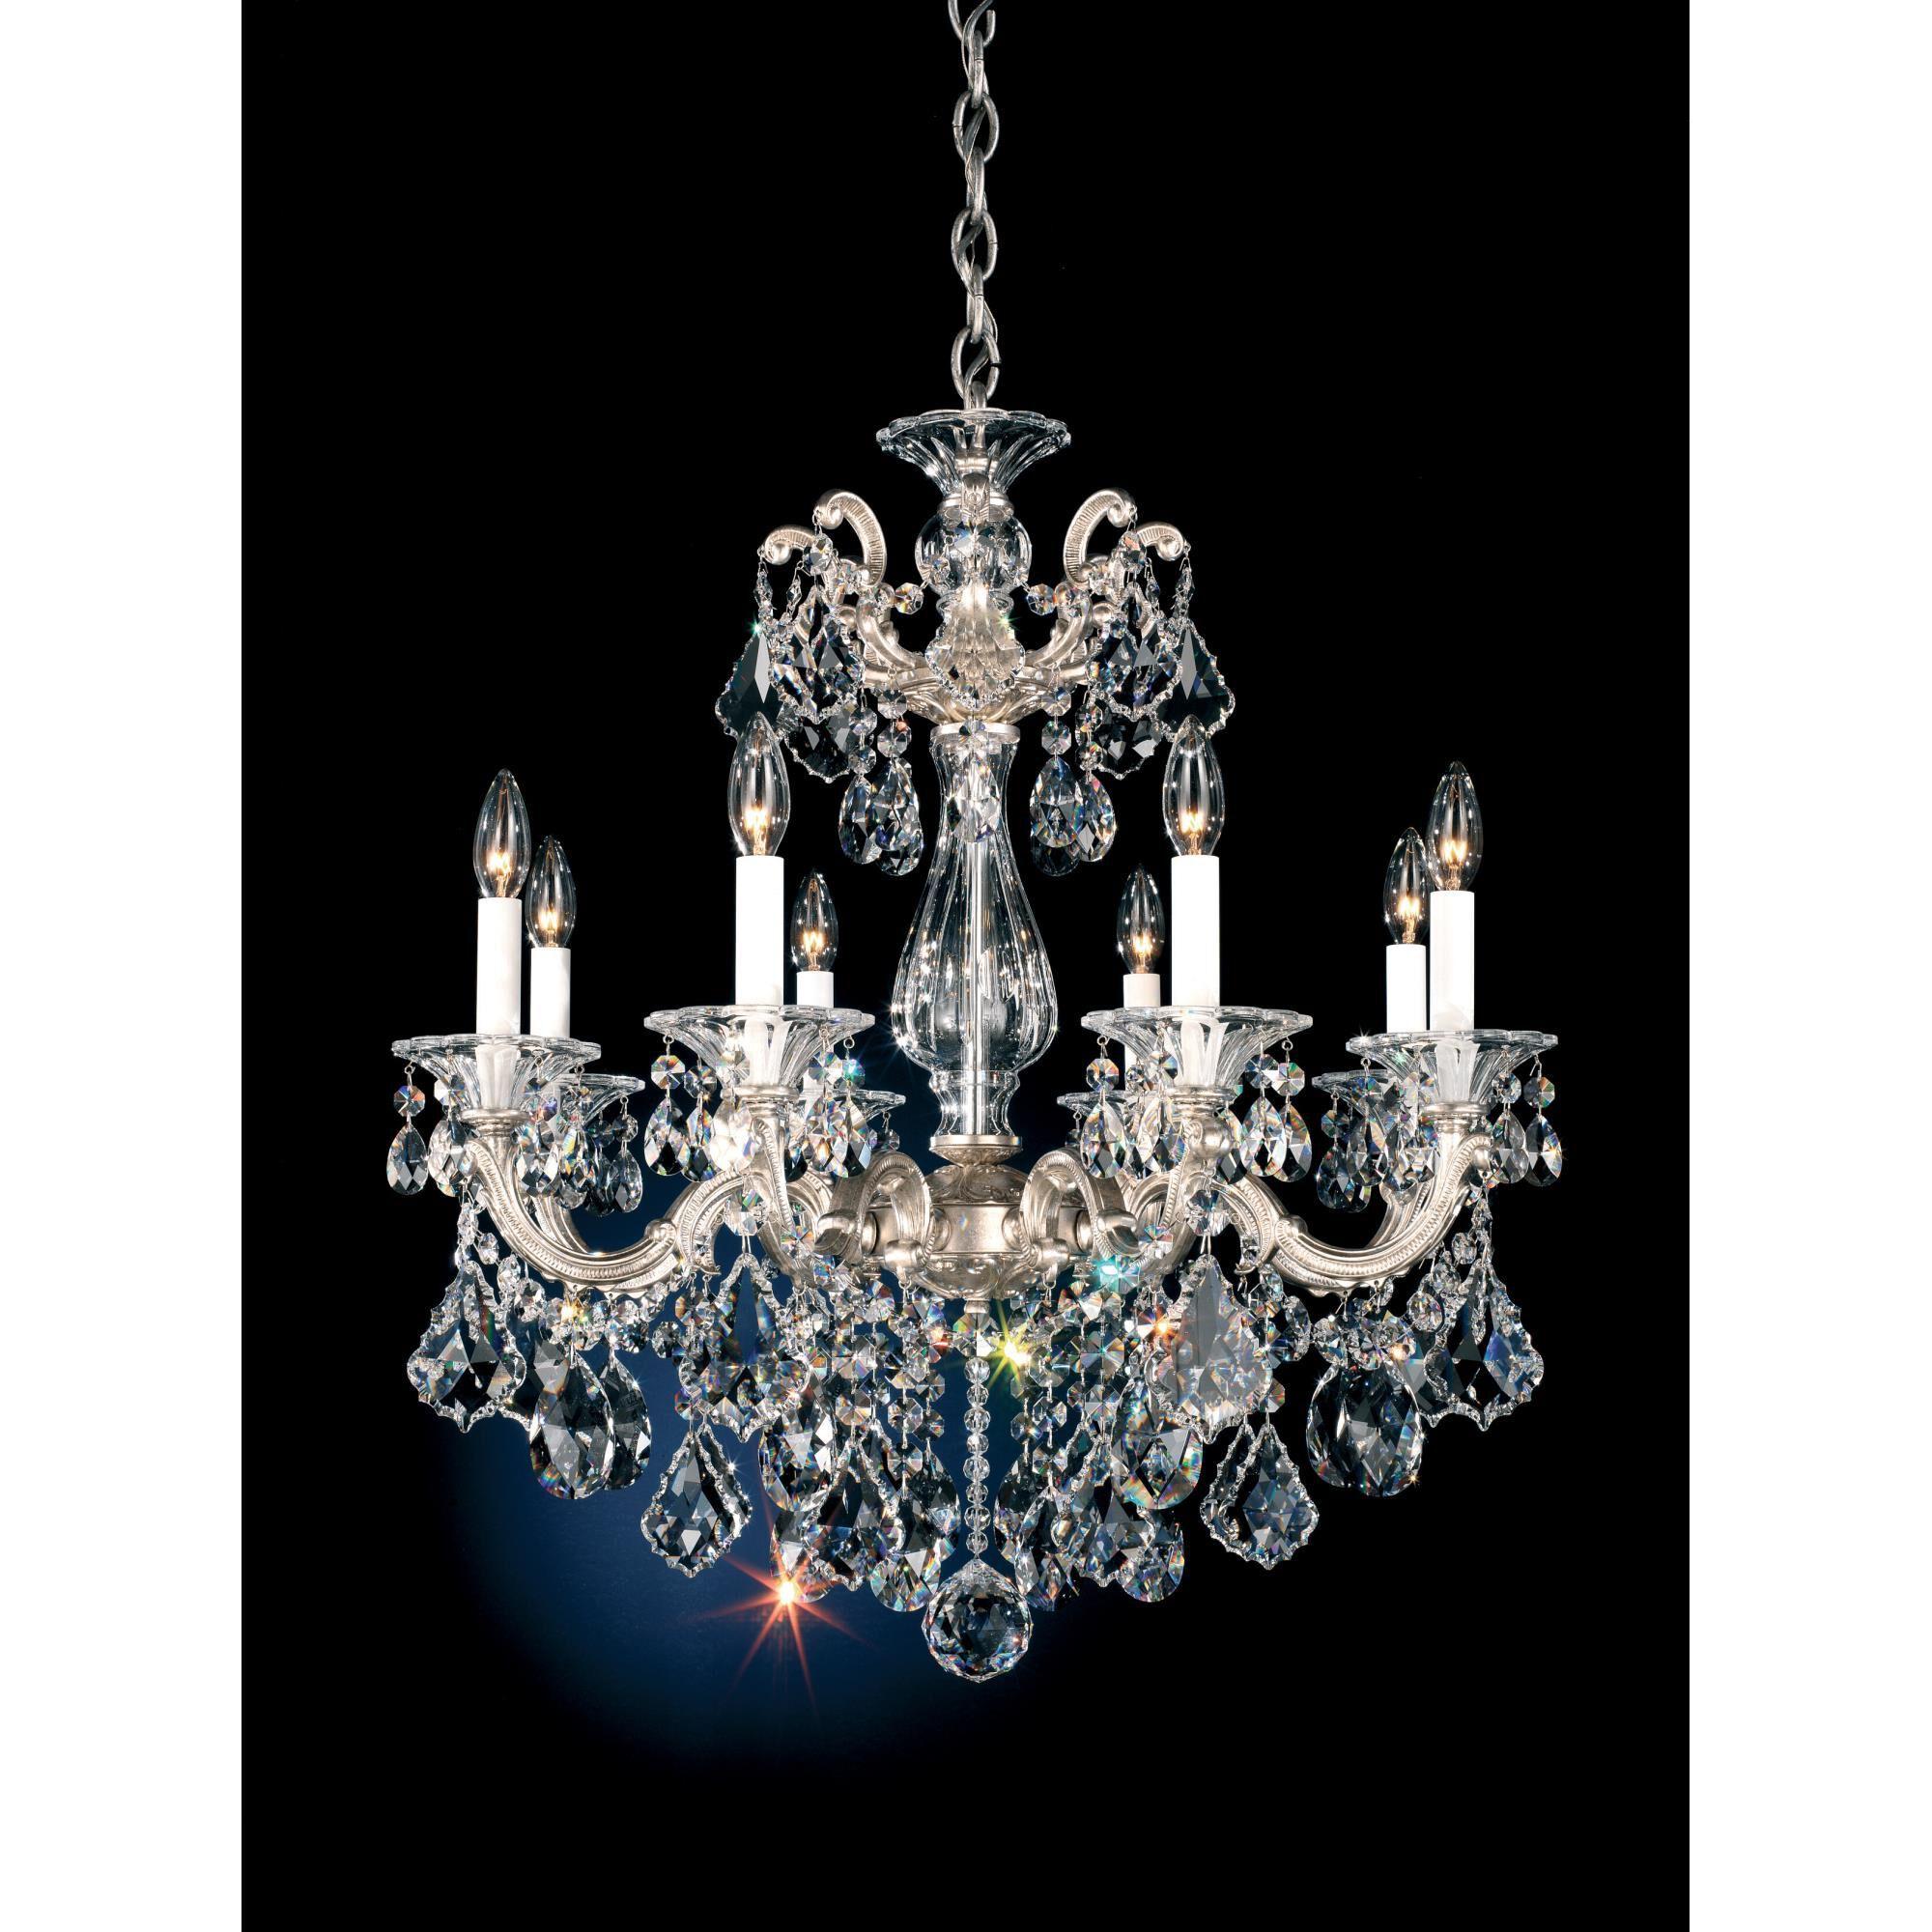 La Scala 25 Inch 8 Light Chandelier Capitol Lighting Crystal Chandelier Chandelier Lighting Candle Style Chandelier